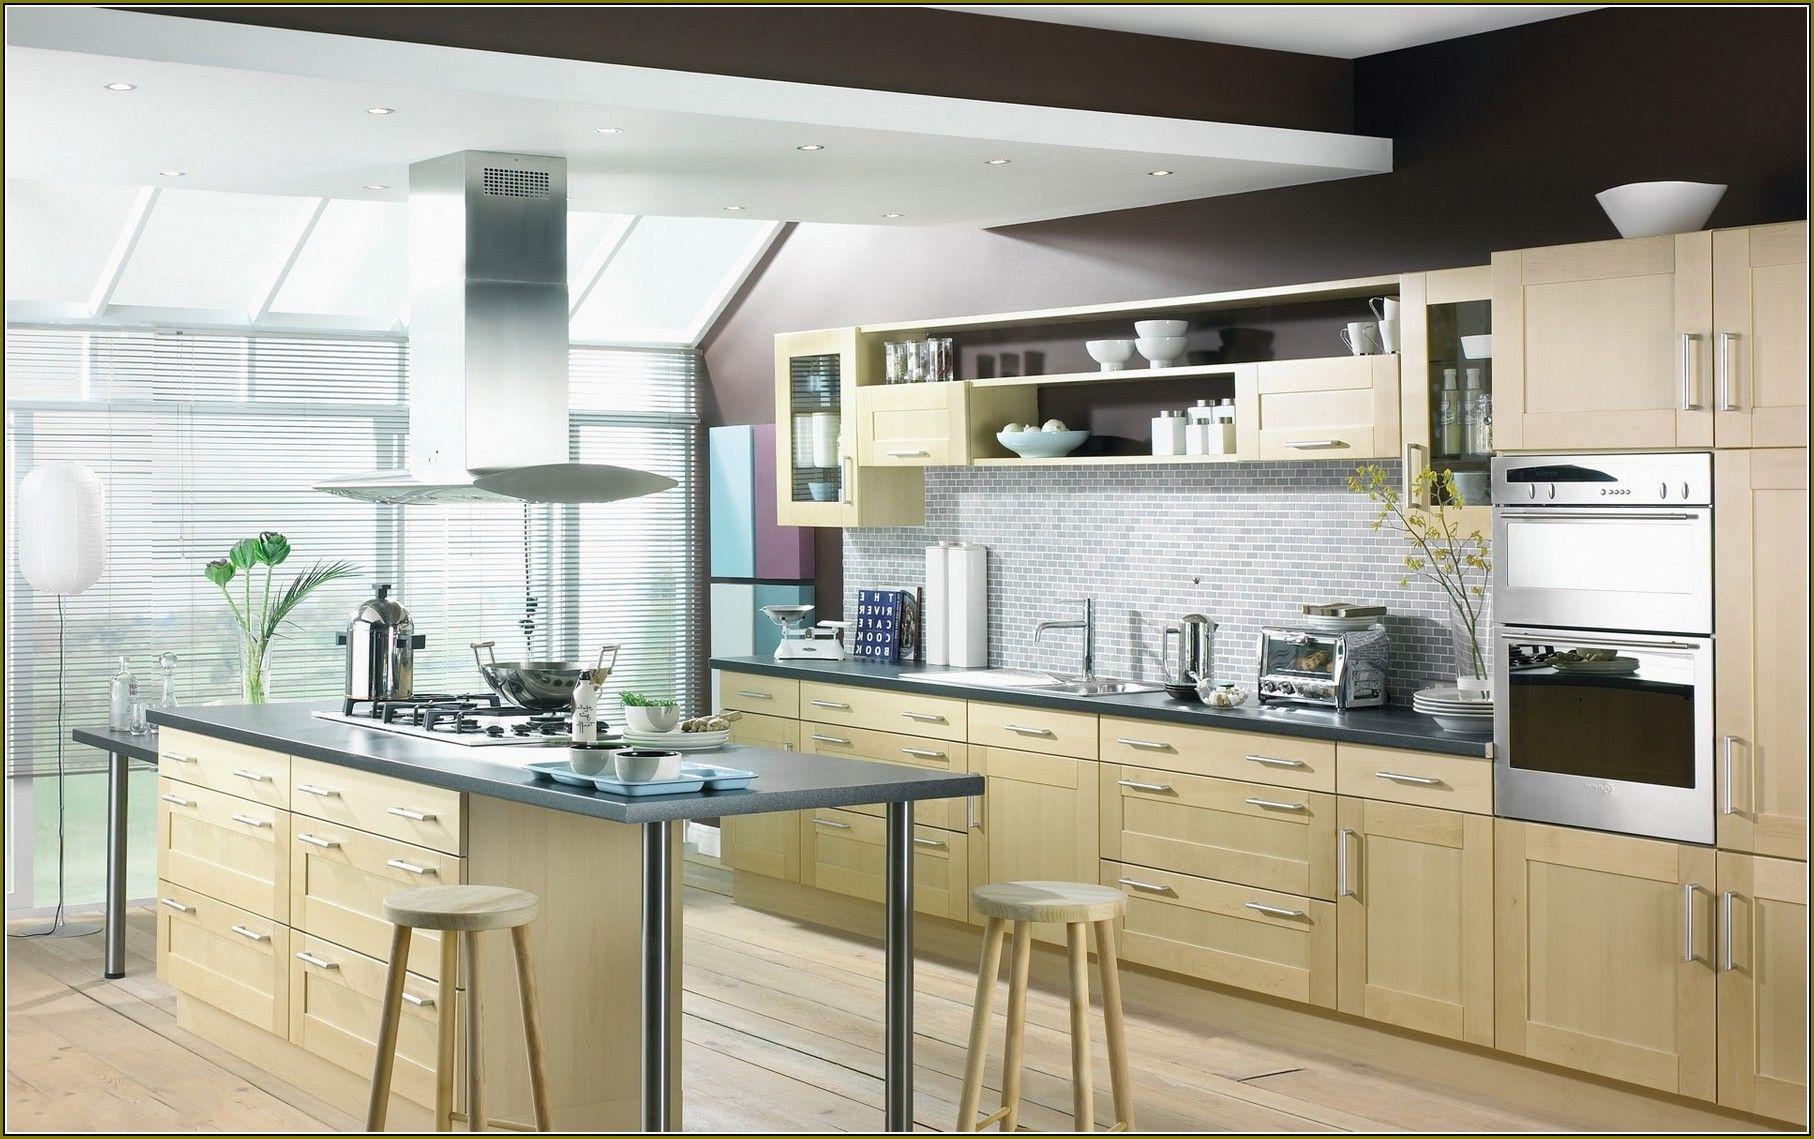 Modern Birch Kitchen Cabinets | Remodelación de cocina | Pinterest